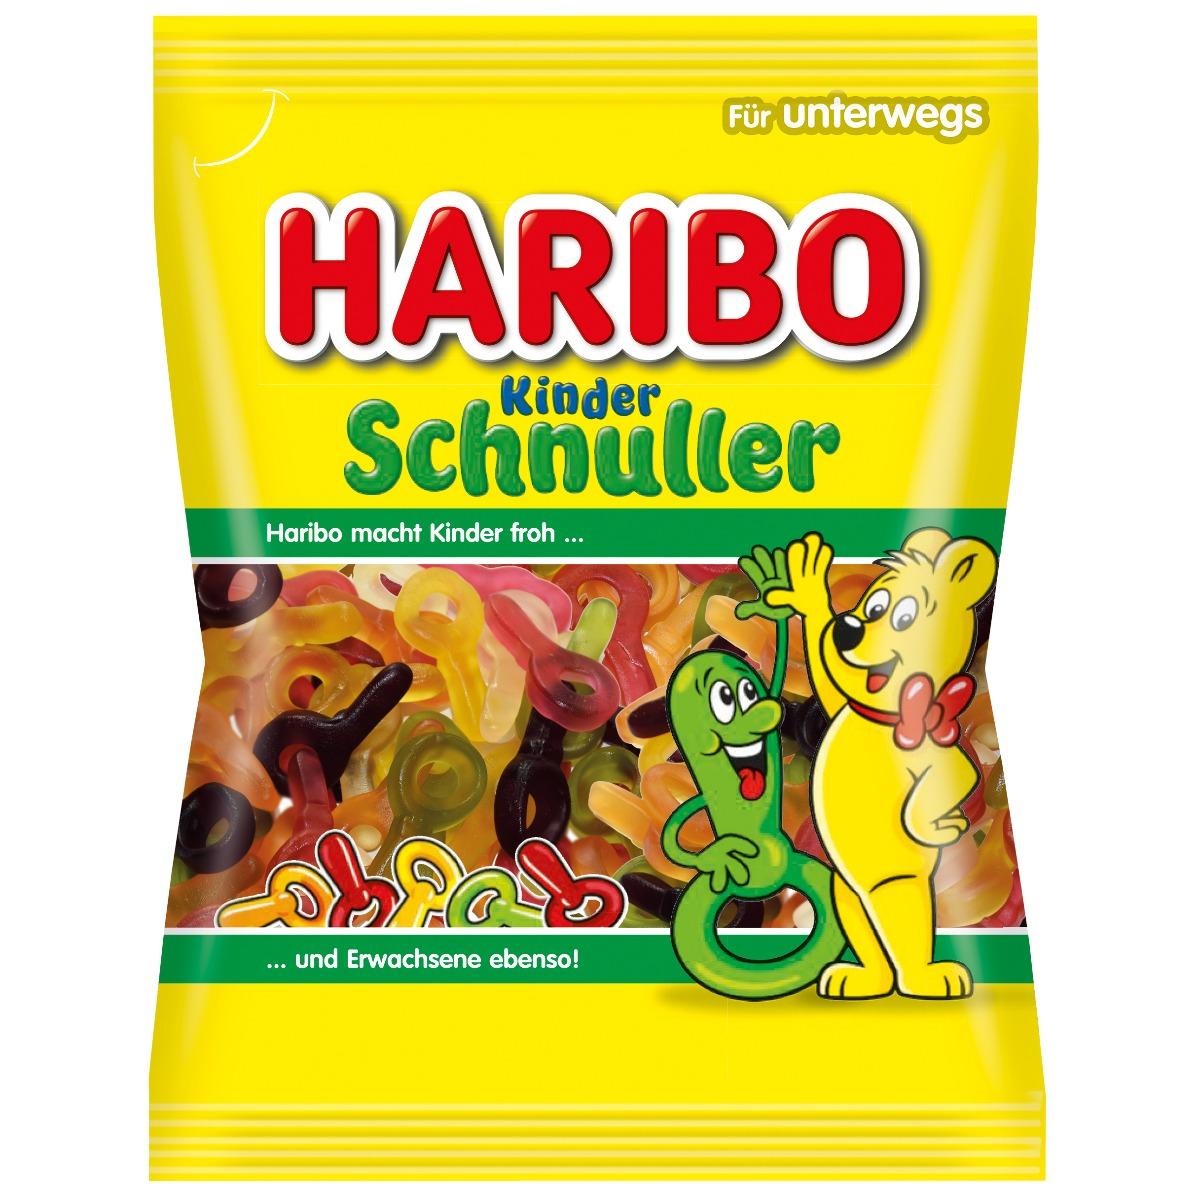 Jeleuri Haribo Schnuller, 100 g imagine